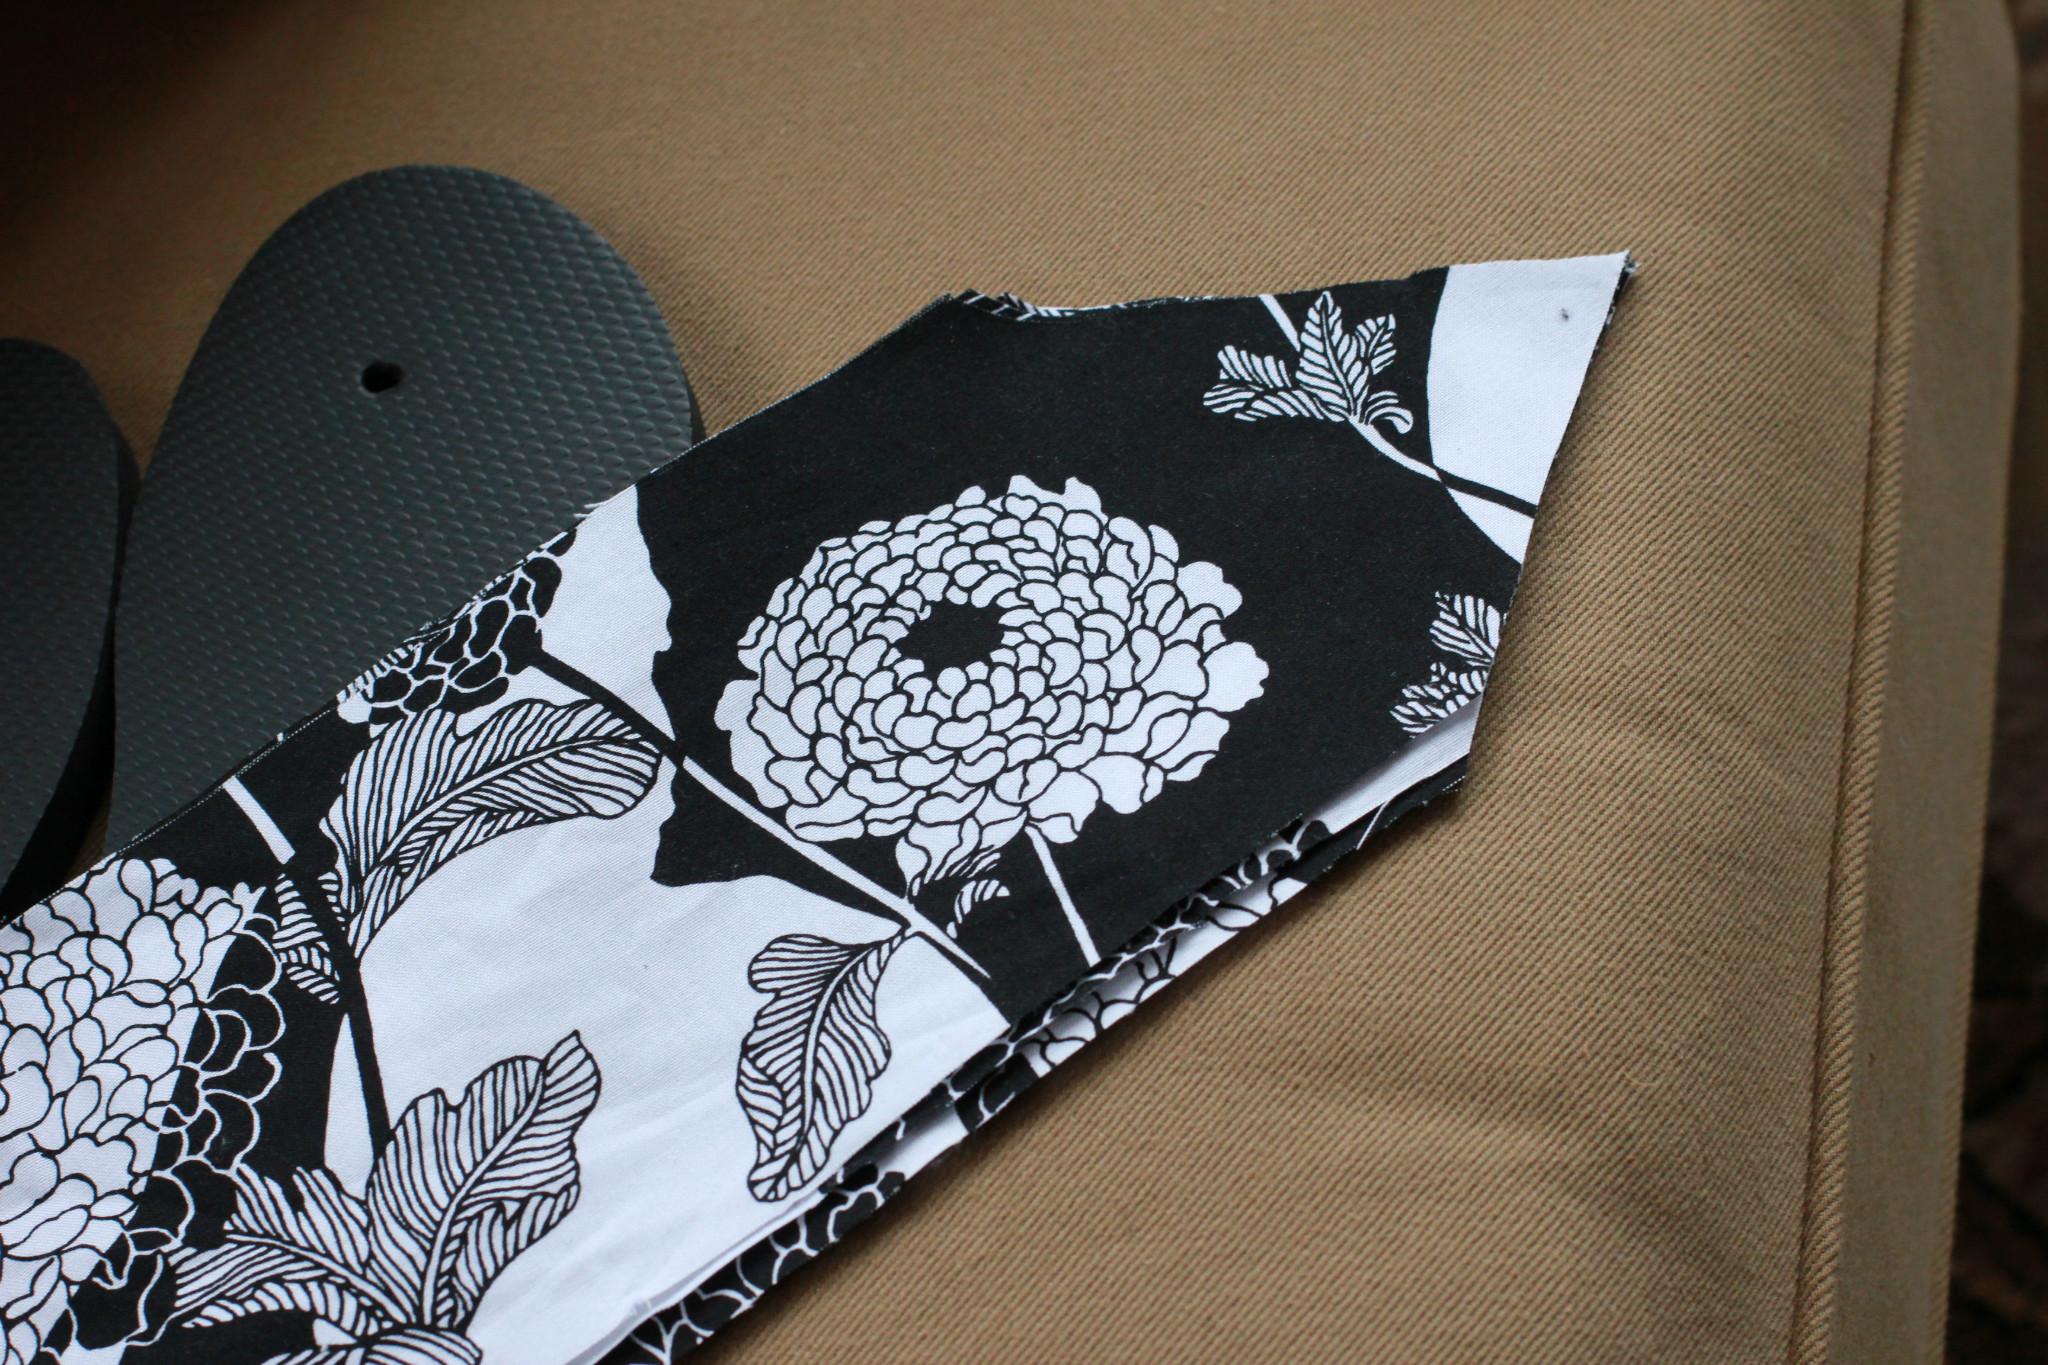 Kate Spade Inspired Diy Fabric Flip Flops For Just 3 50